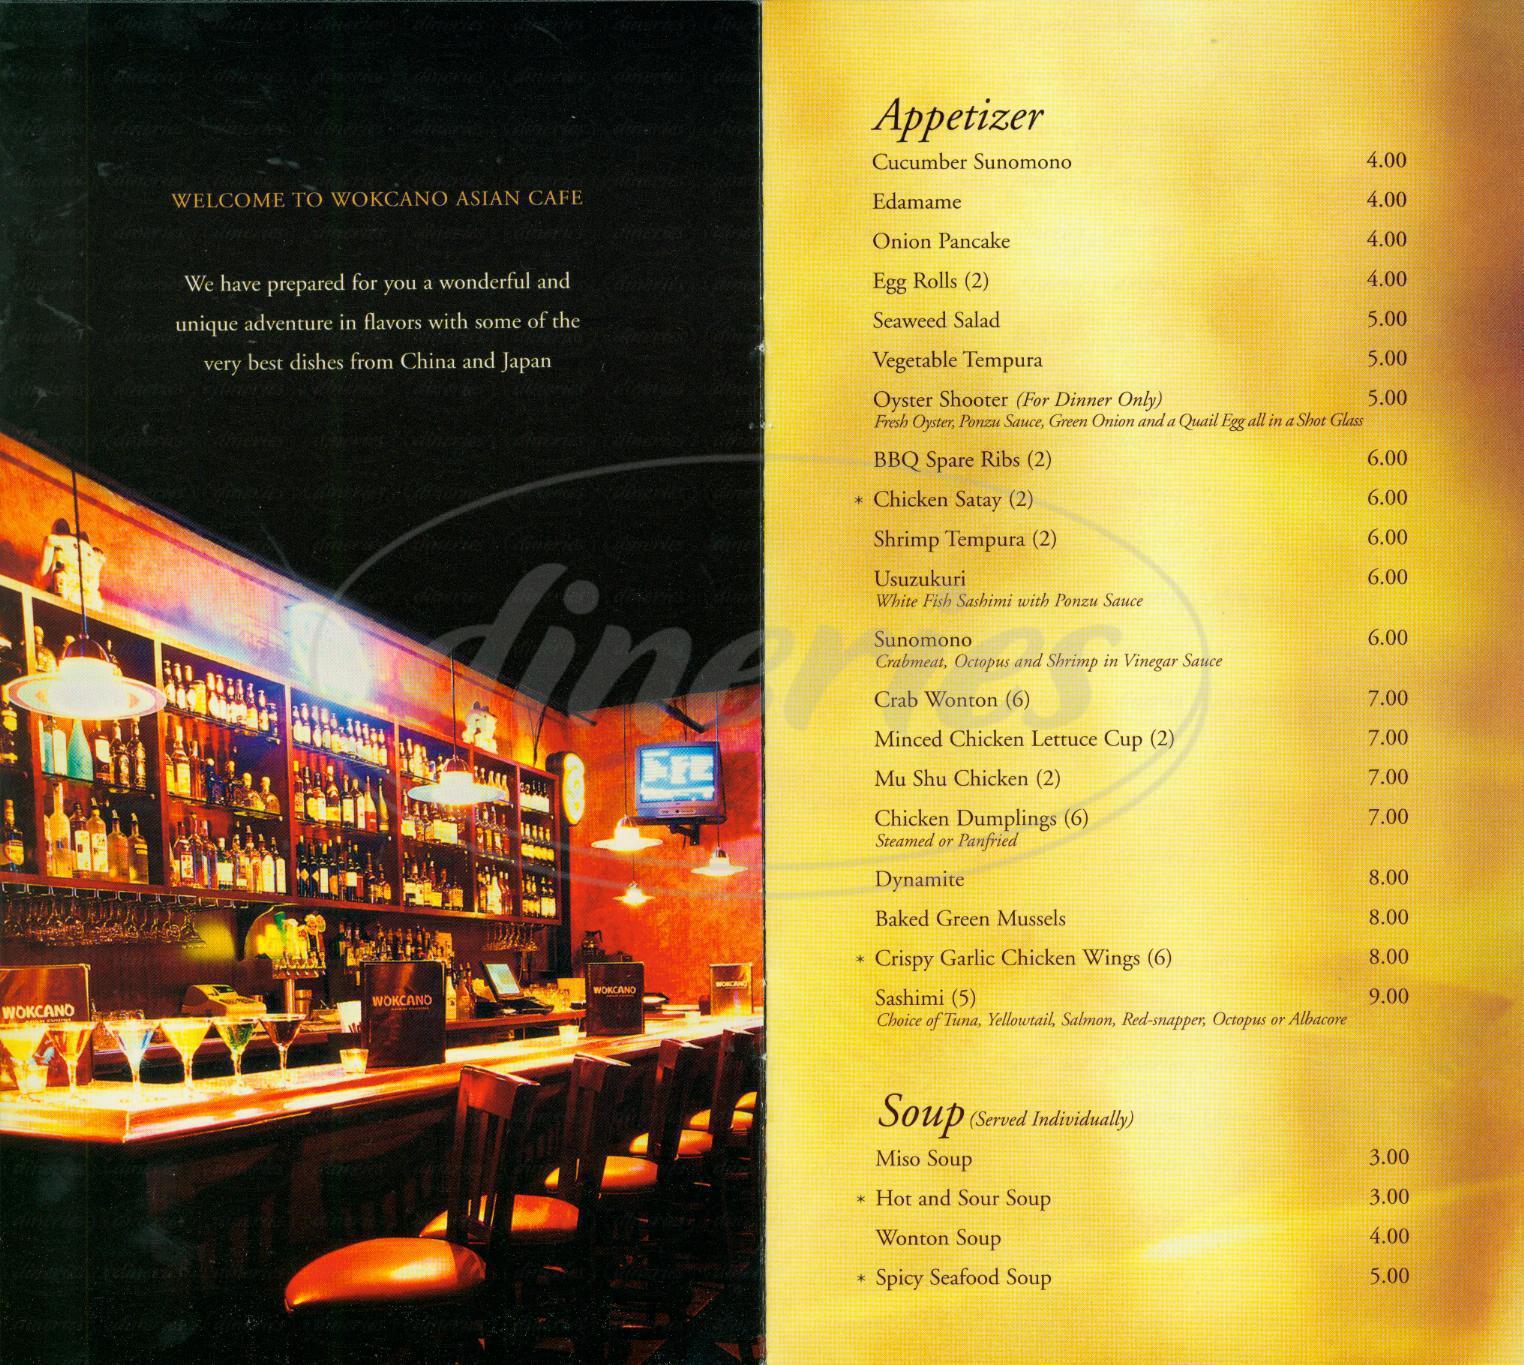 menu for Wokcano